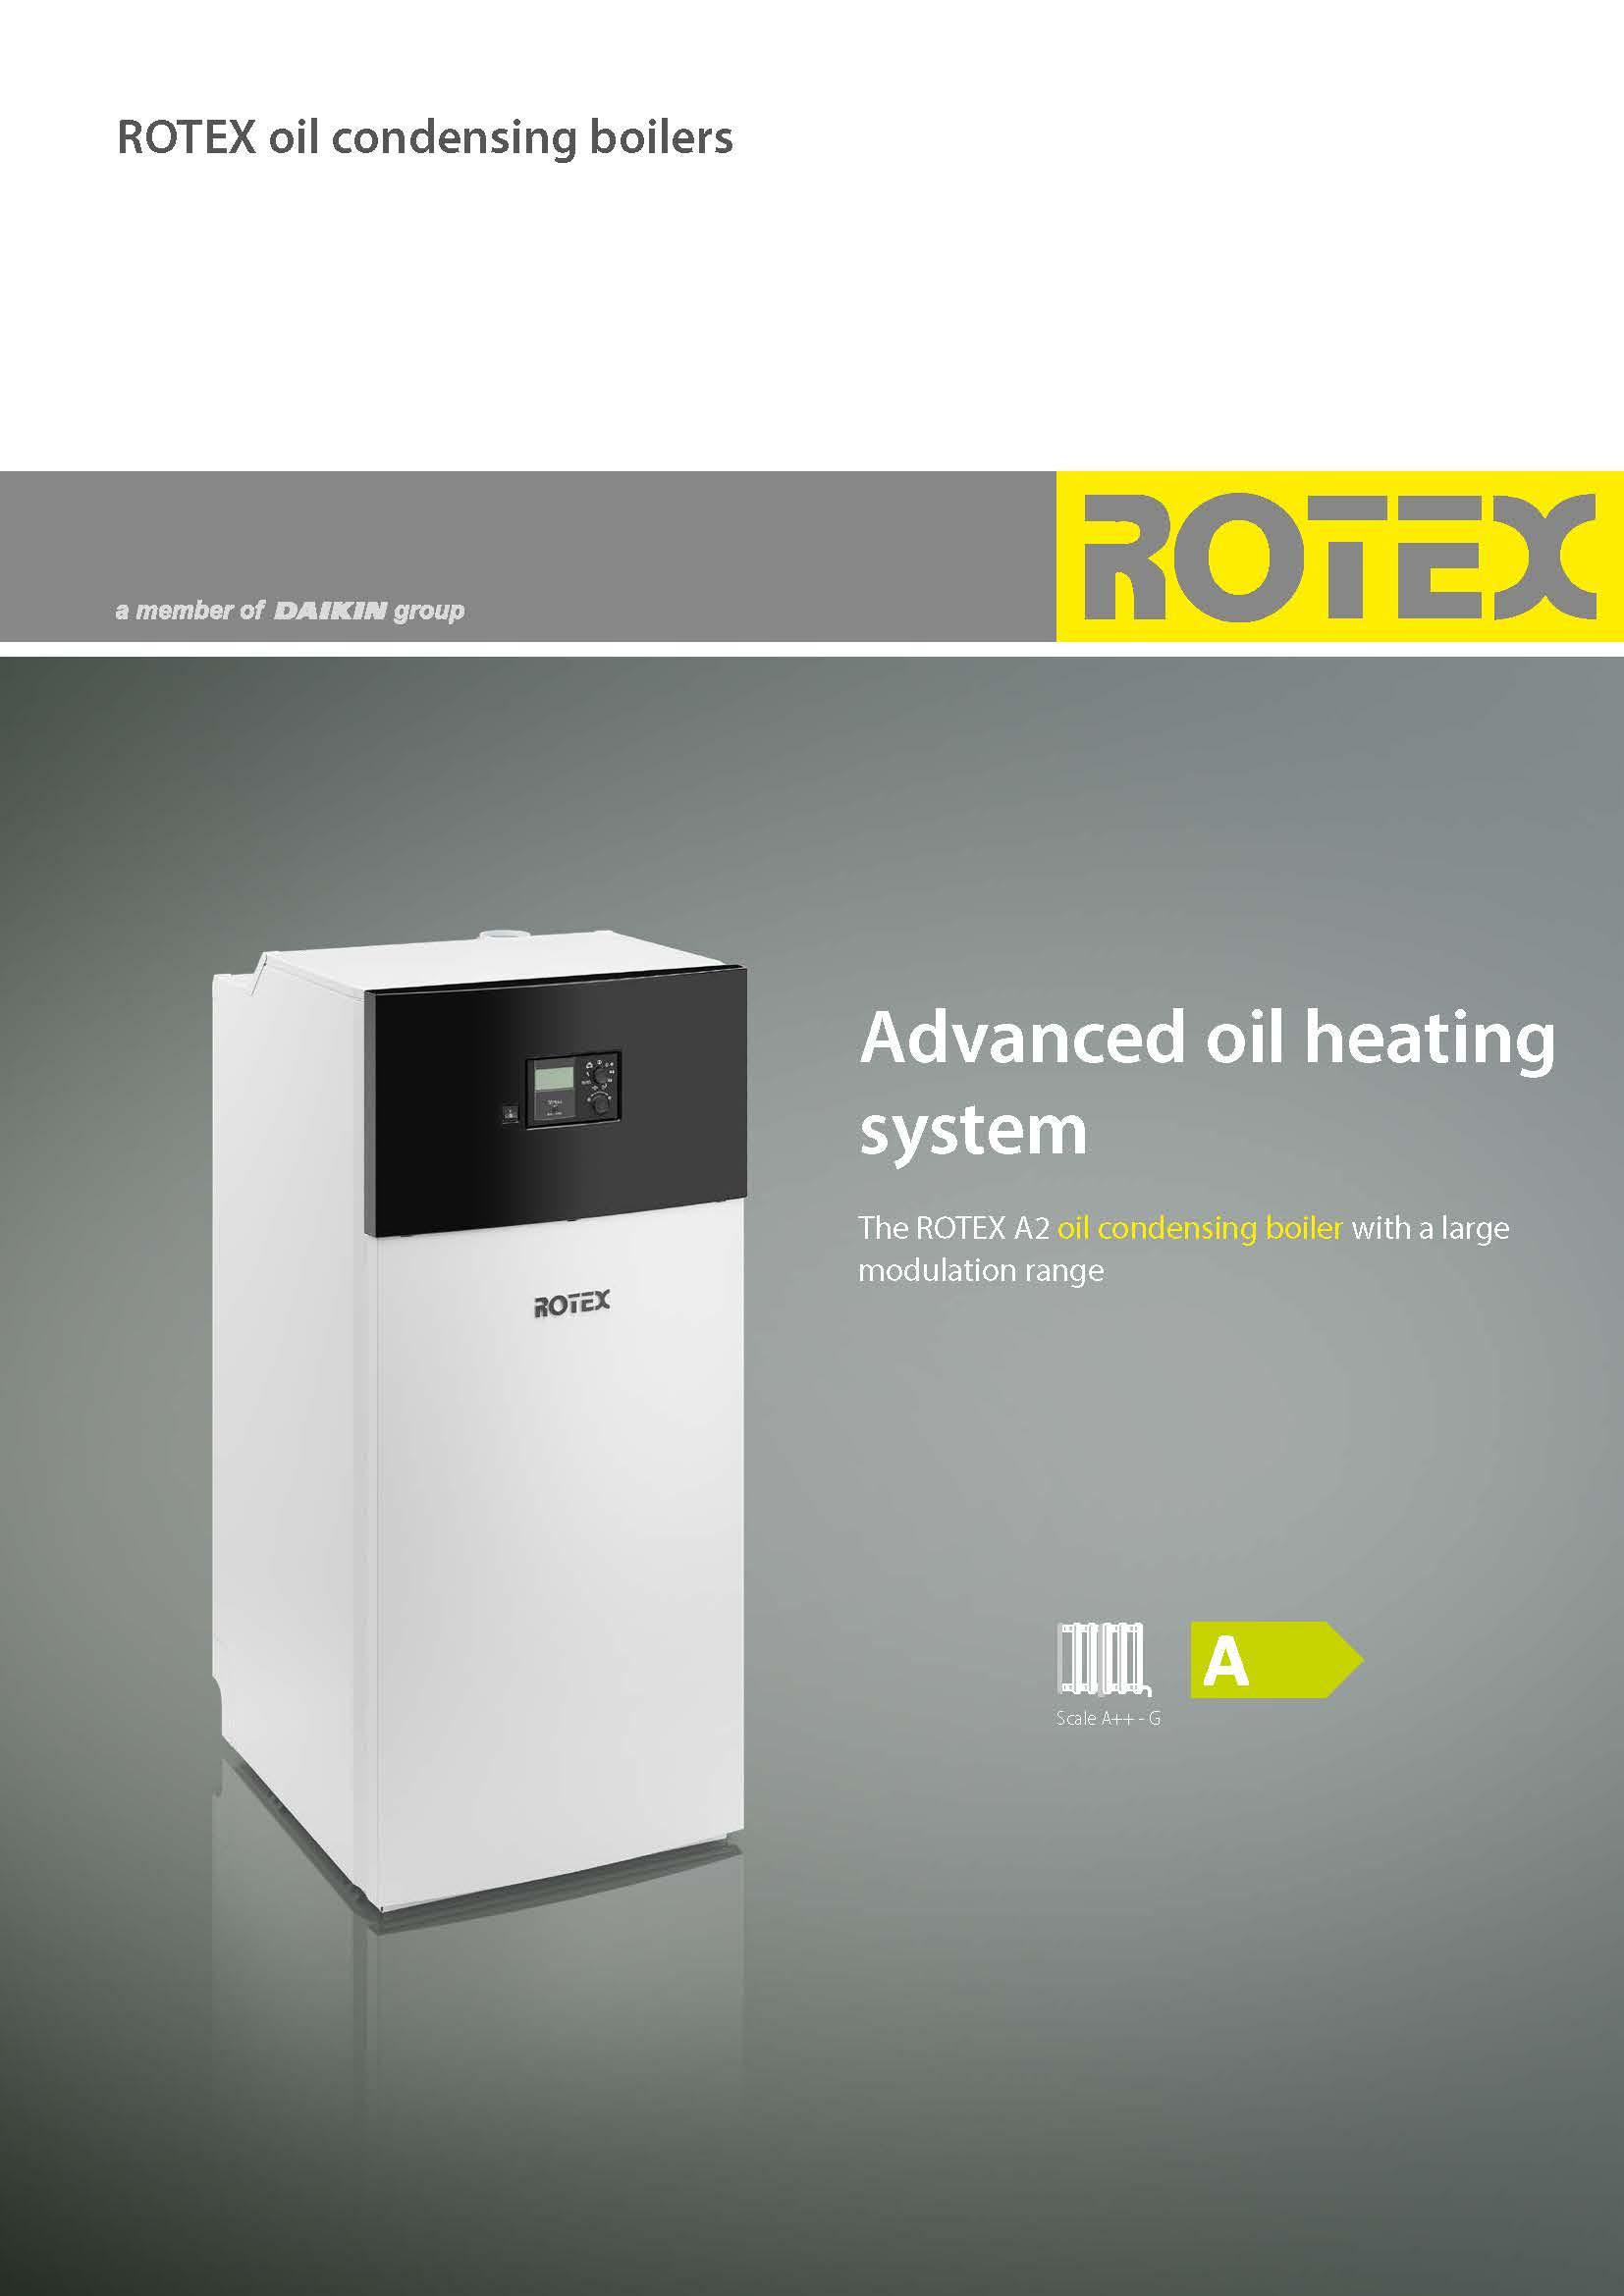 LEAP ROTEX-Brochure-A2 Boiler-Cover.jpg